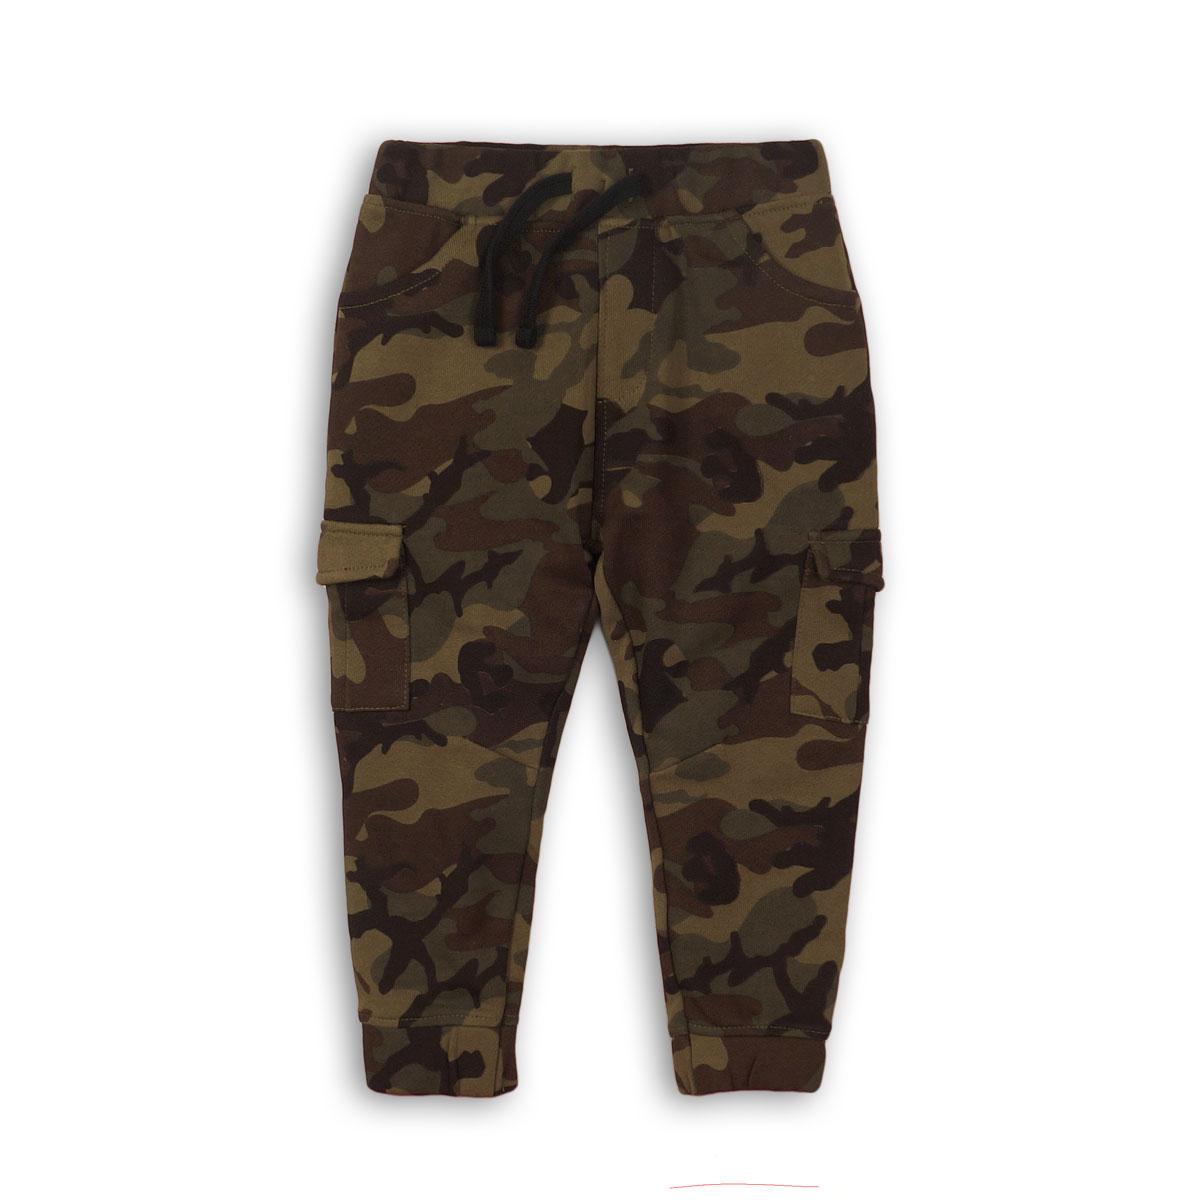 Pantalon camuflajeado con cordón